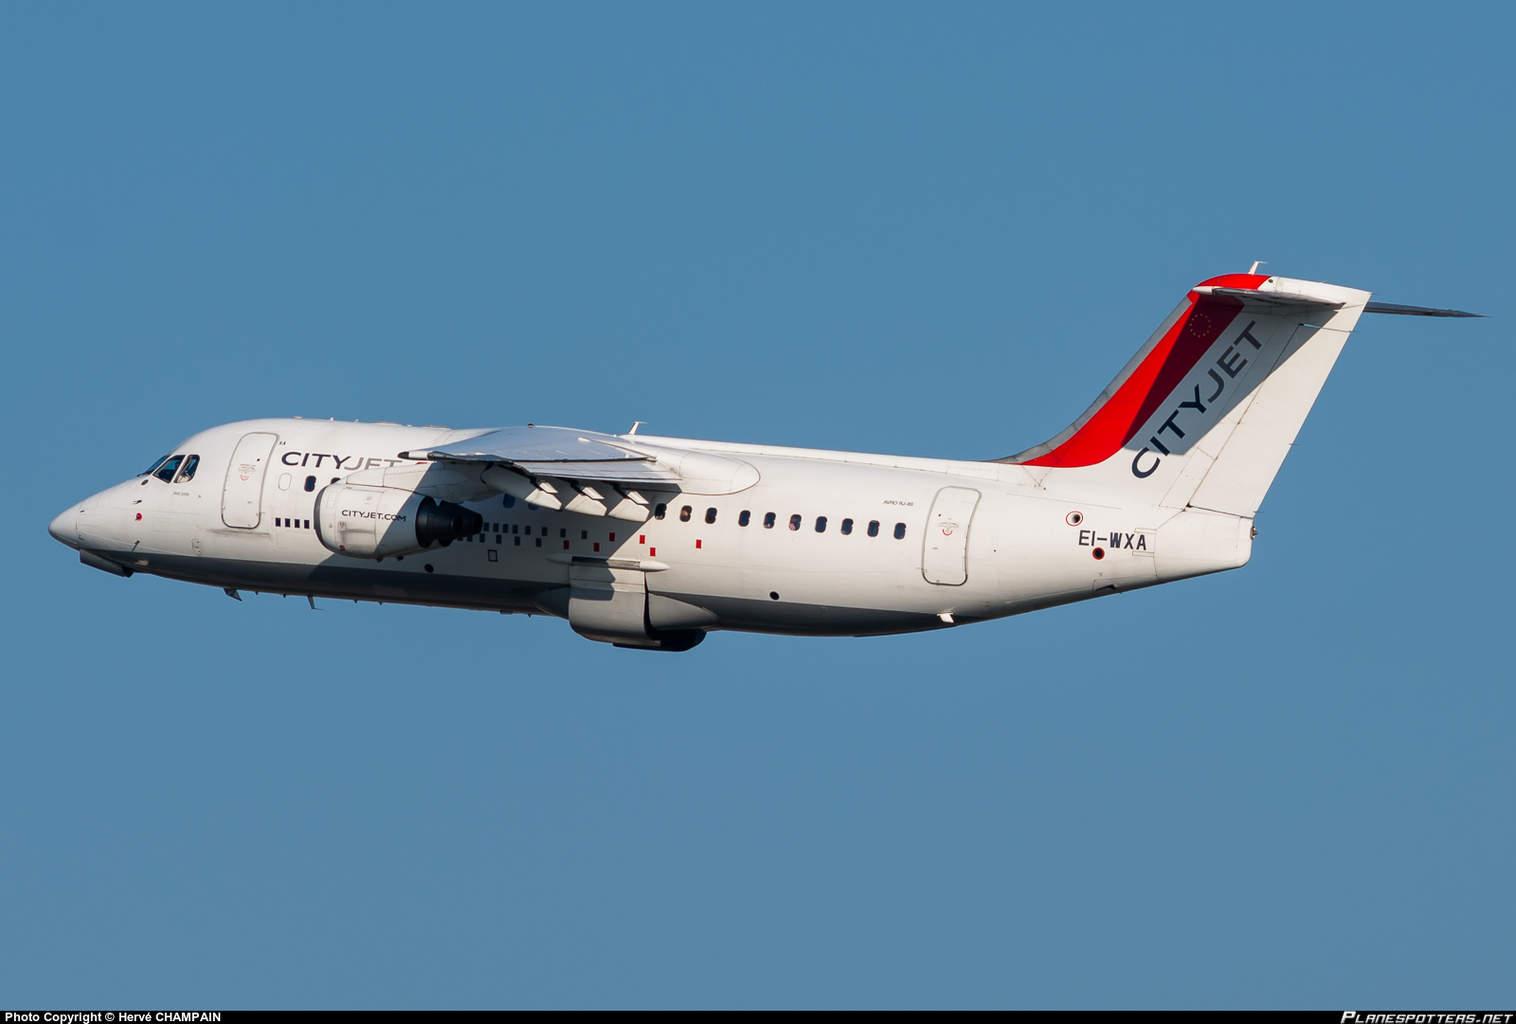 ei-wxa-cityjet-british-aerospace-avro-rj85_PlanespottersNet_633543